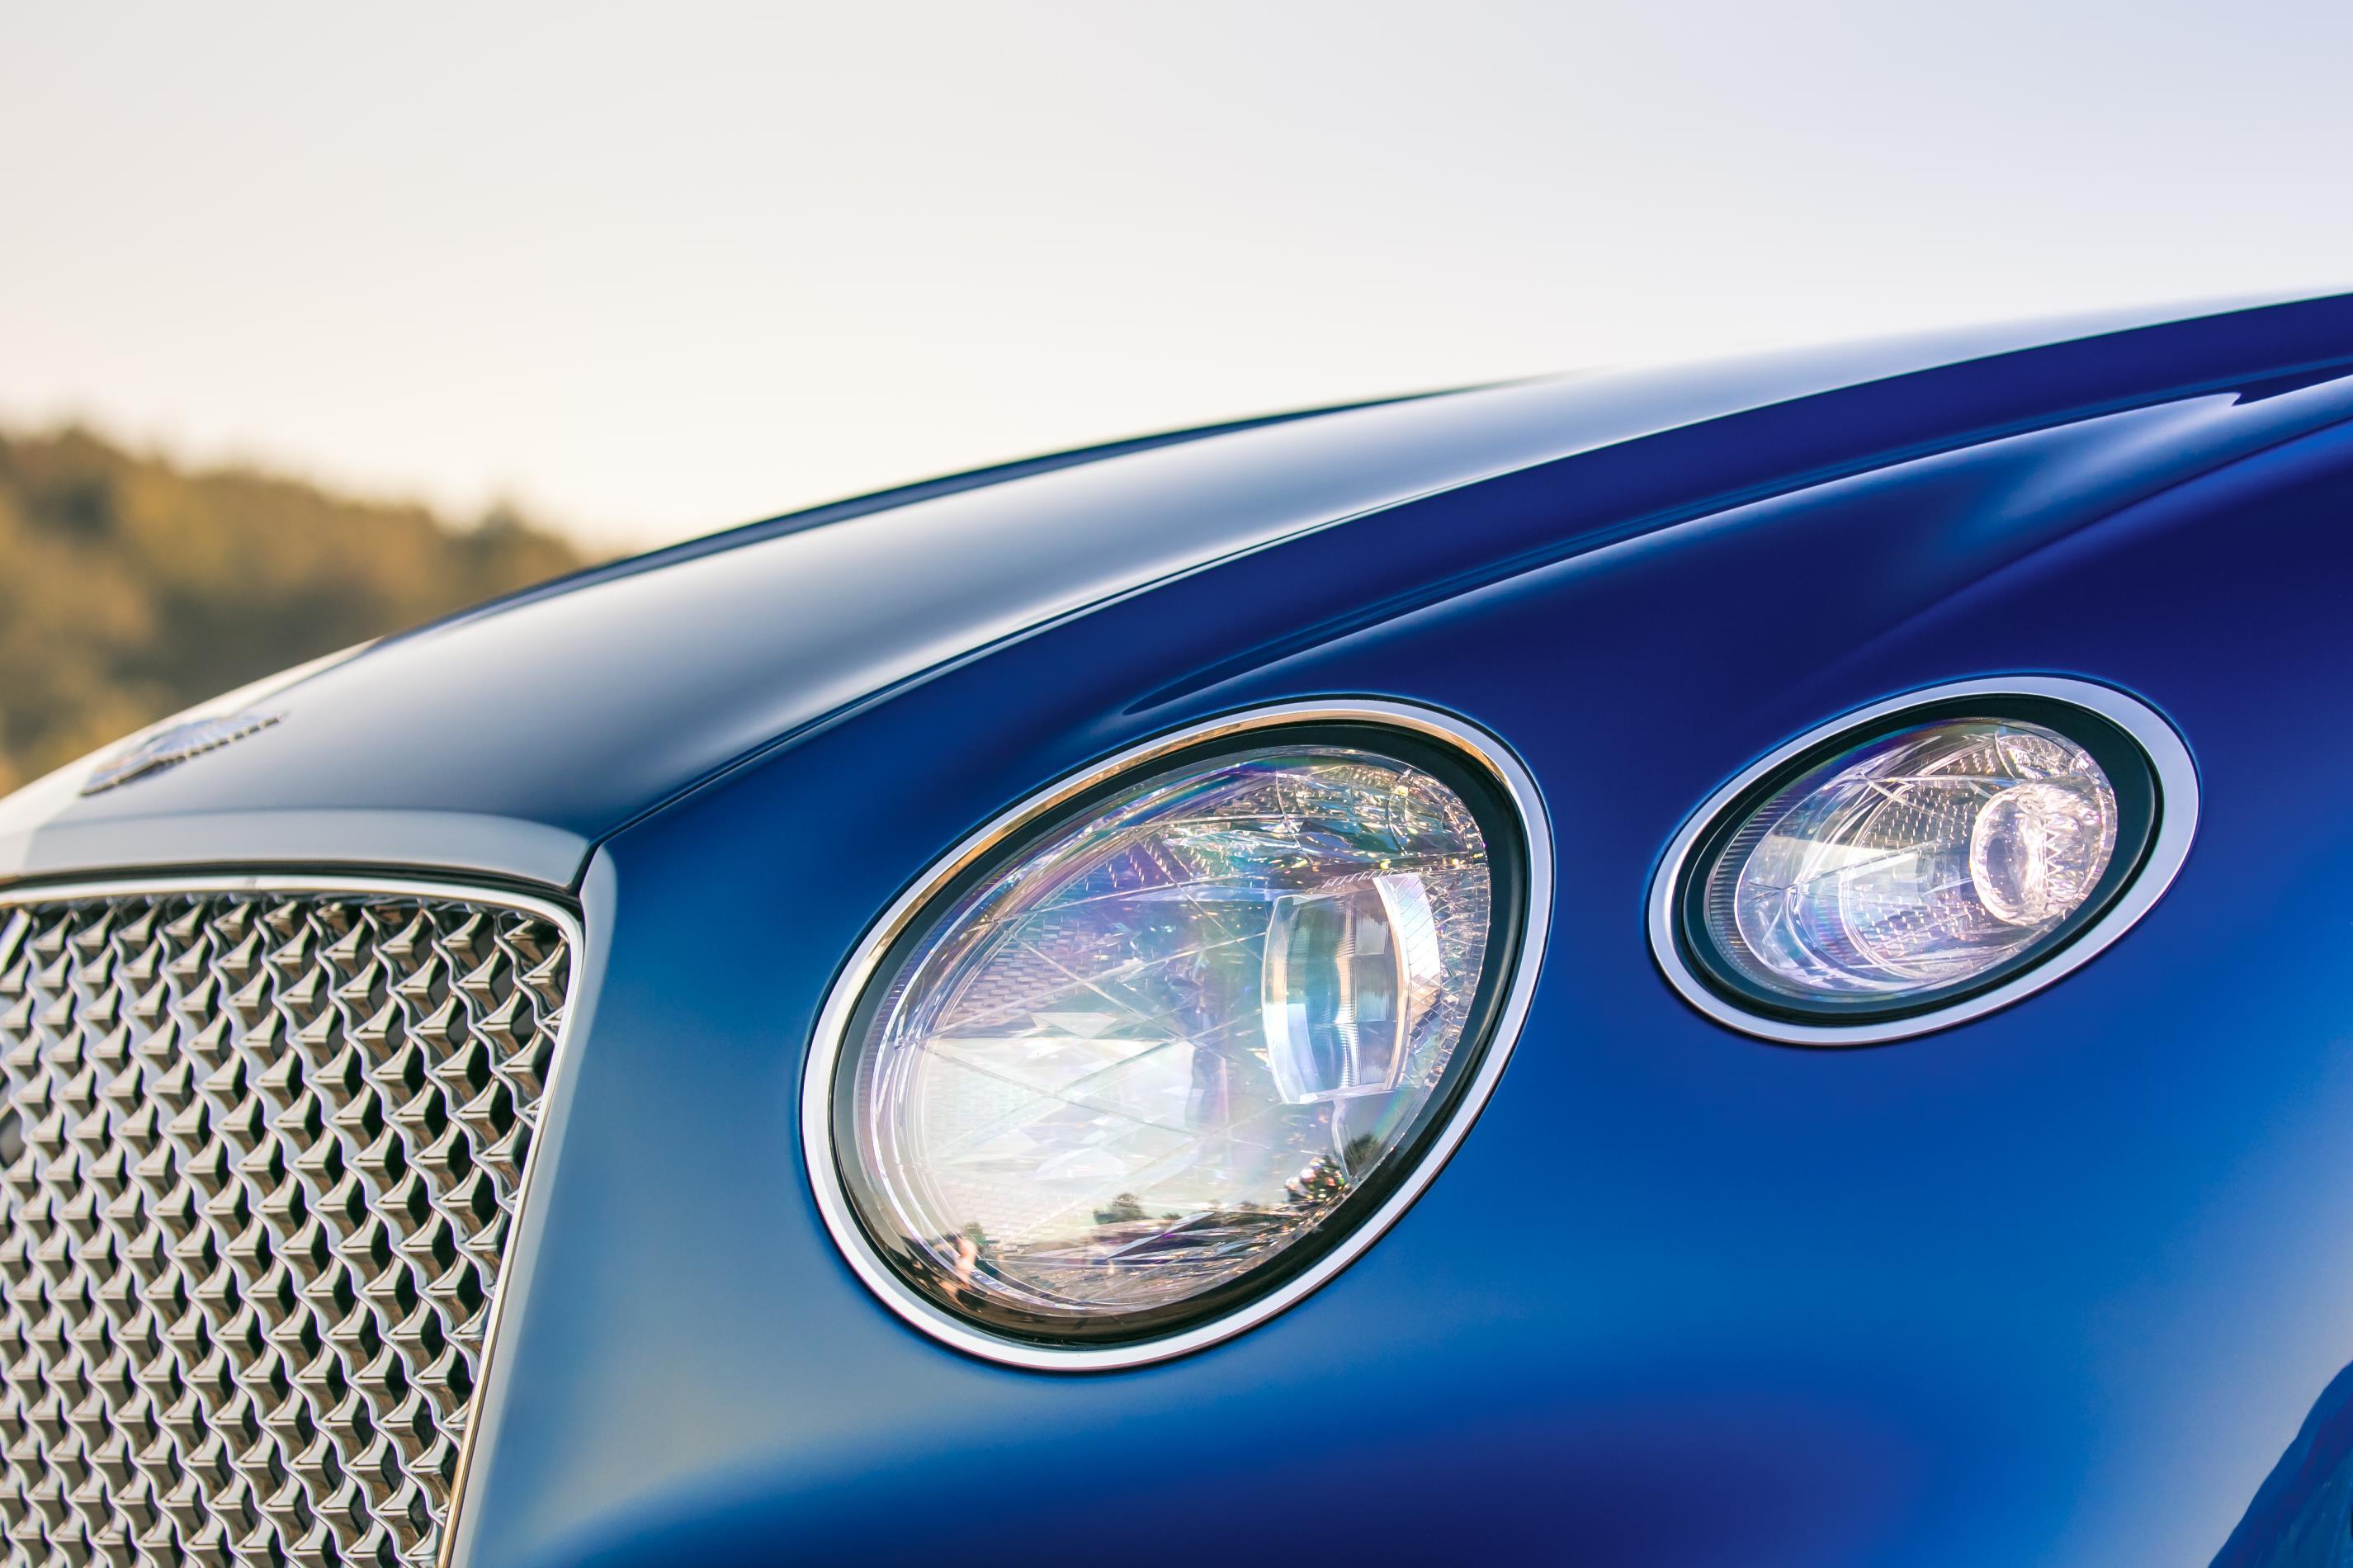 2018 Bentley Continental GT headlights